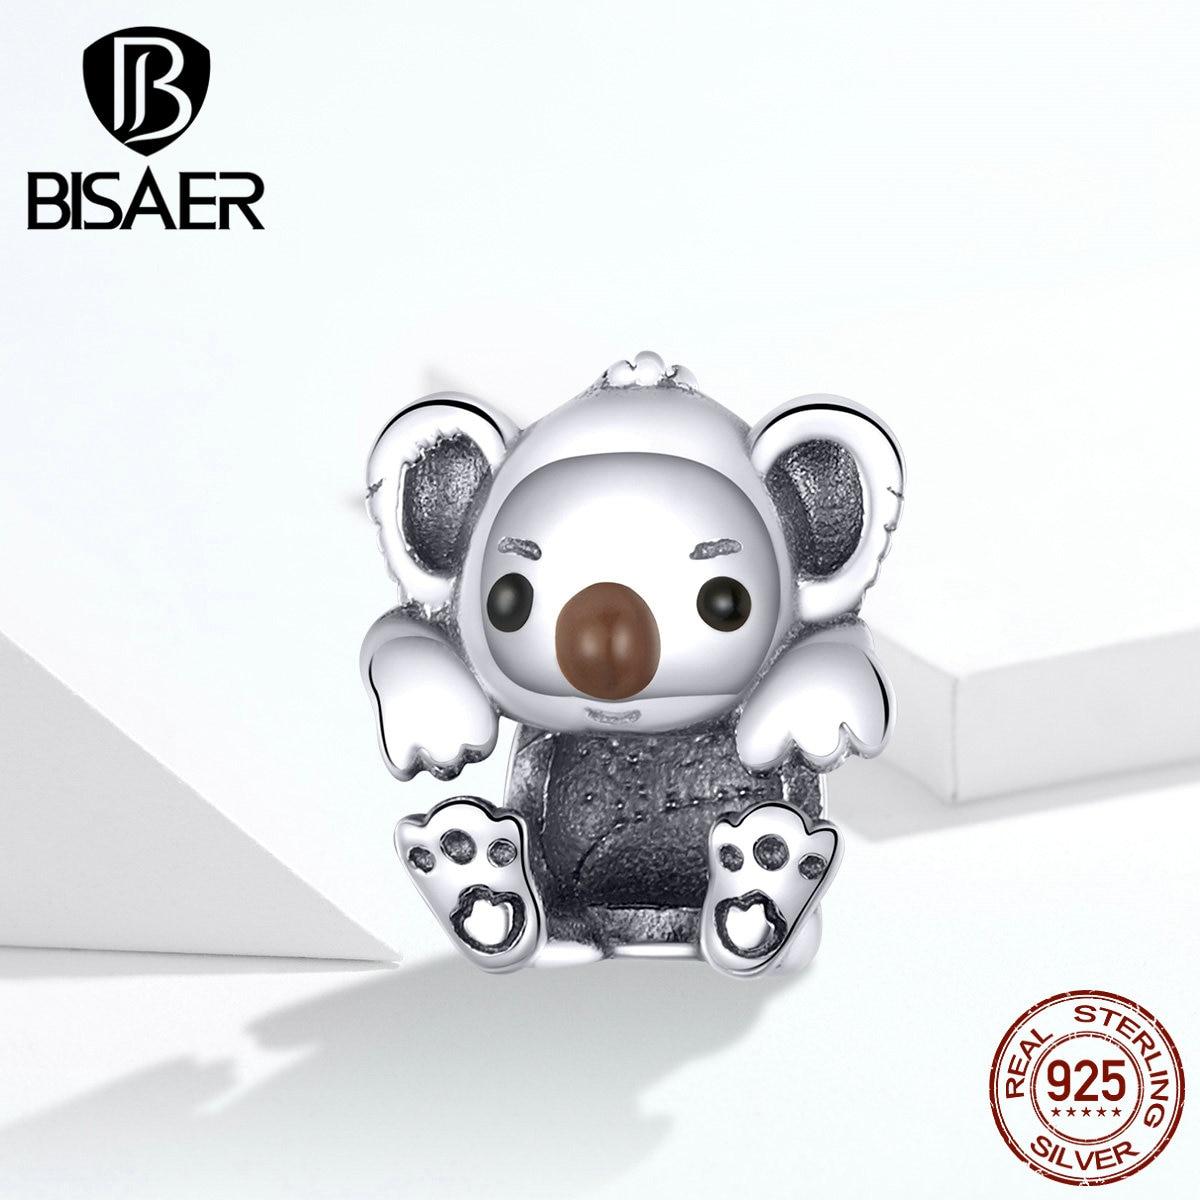 Colgantes de plata de ley 100% 925 con diseño de Animal serie KOALA para bebé, pulseras de dijes para mujer, joyería DIY GXC1304